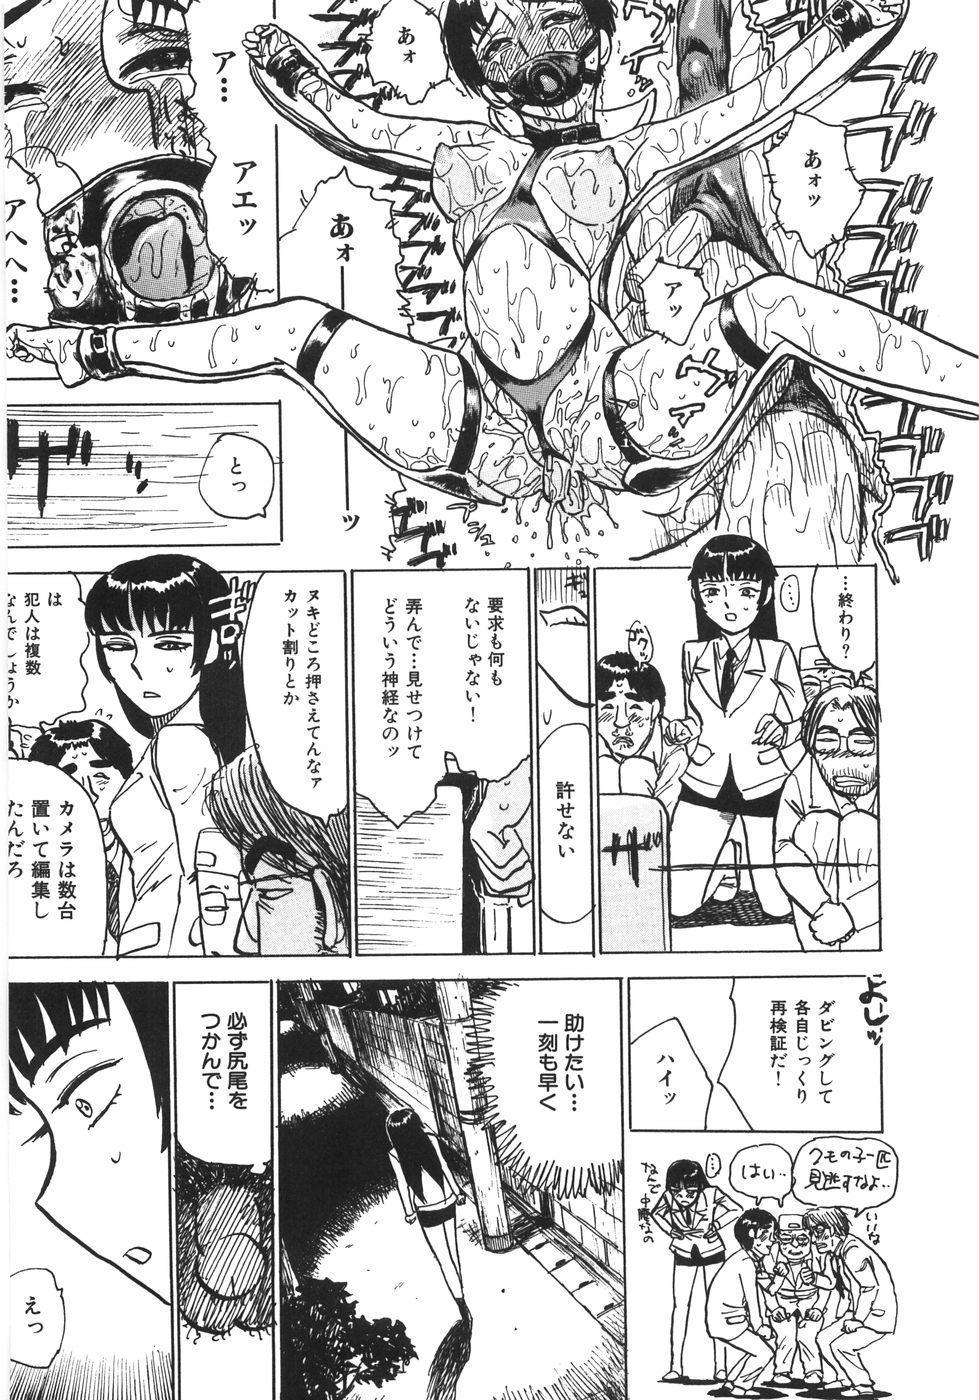 Ningyou no Yakata - The Doll House 159